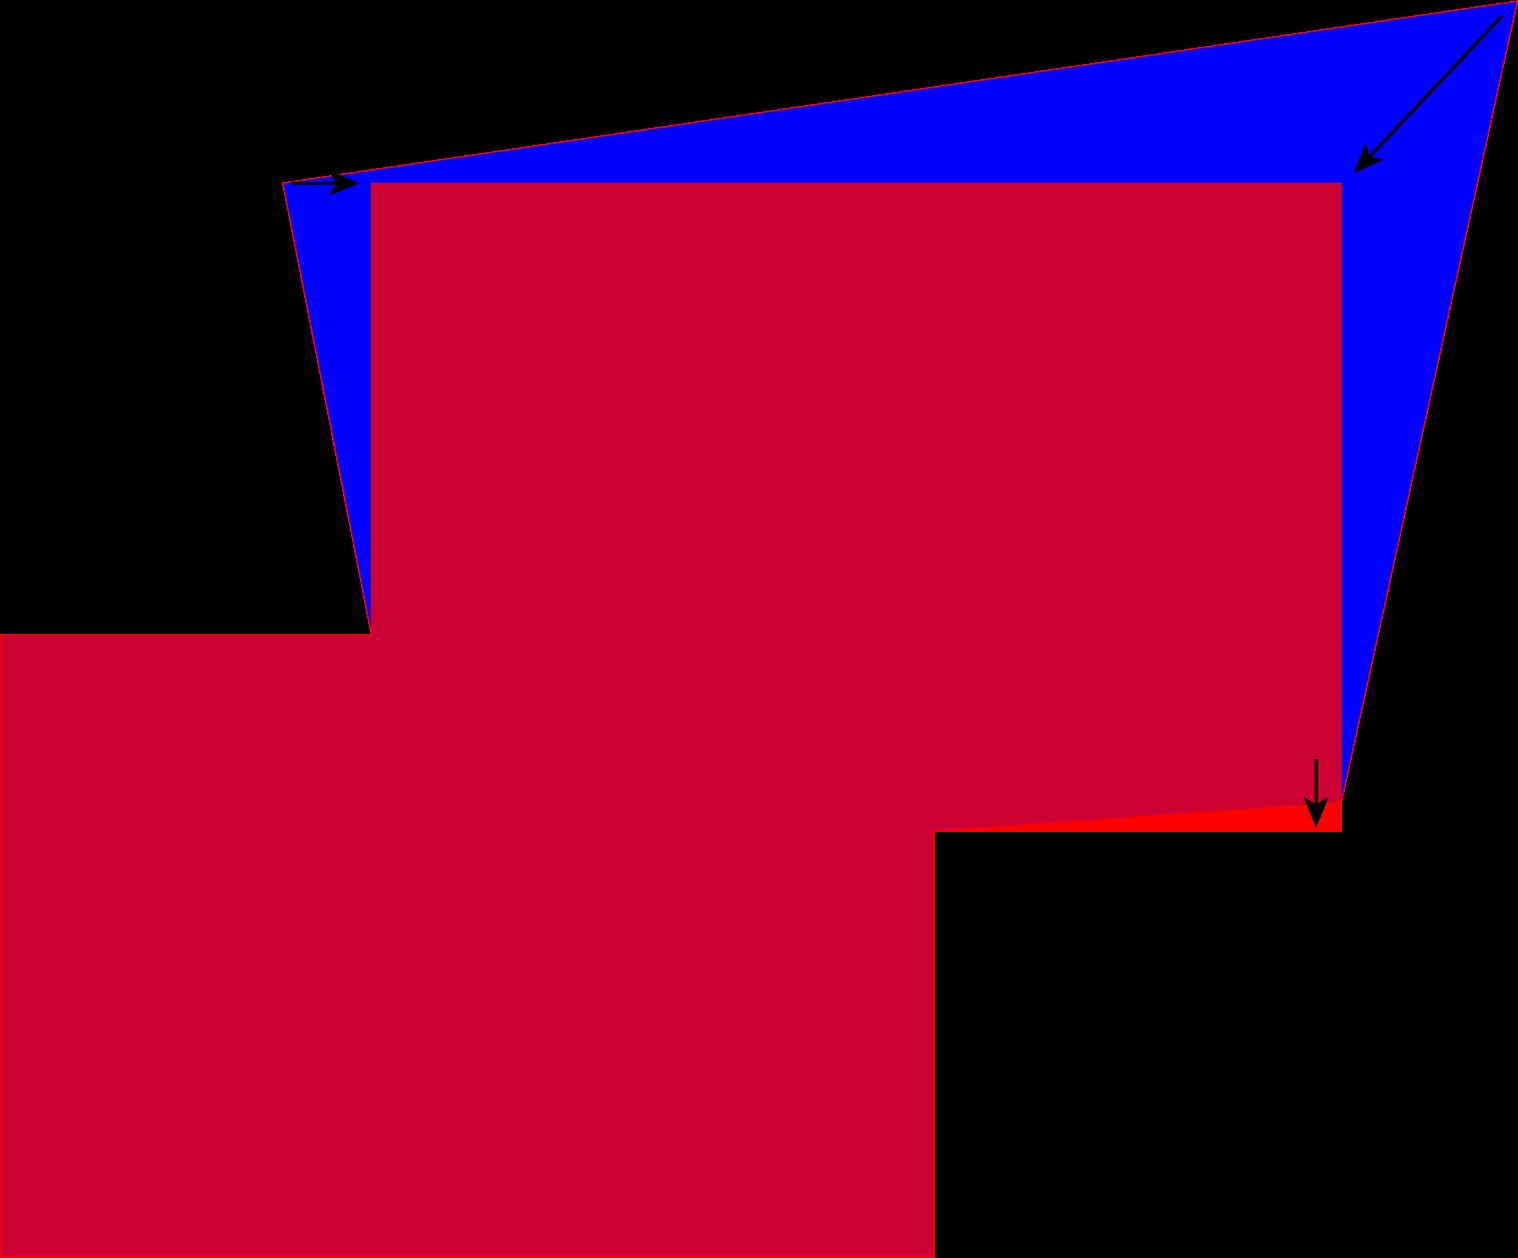 Adobe photoshop warp raster. Clipart tv rectangle shaped object